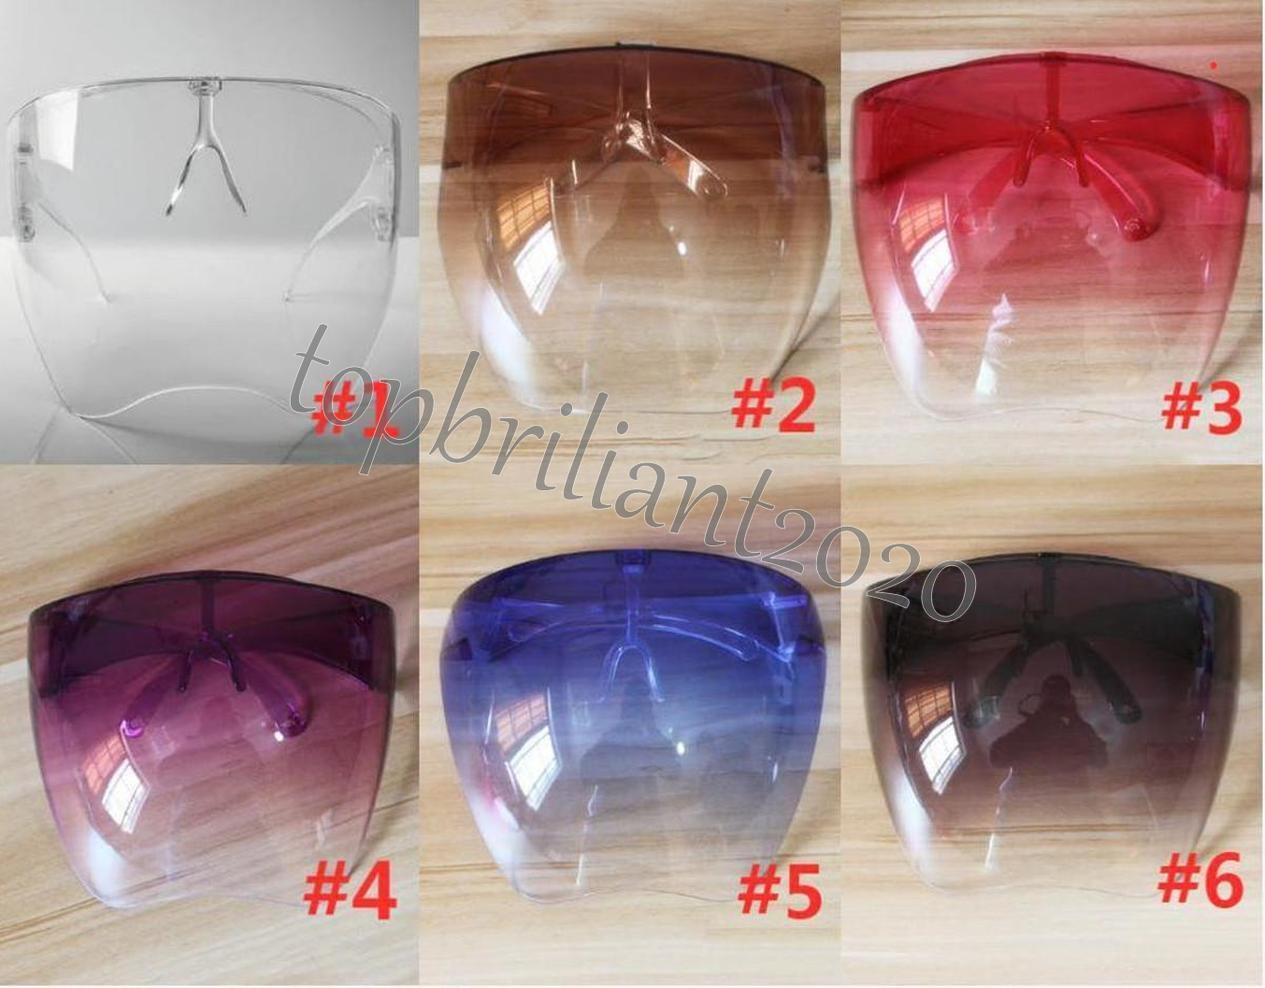 DHL Envio Clear Protetora Face Shield Festa Máscaras Óculos Óculos De Segurança Festa À Prova D 'Água Anti-Spray Máscara Óculos de GOGGLE GOGGLE